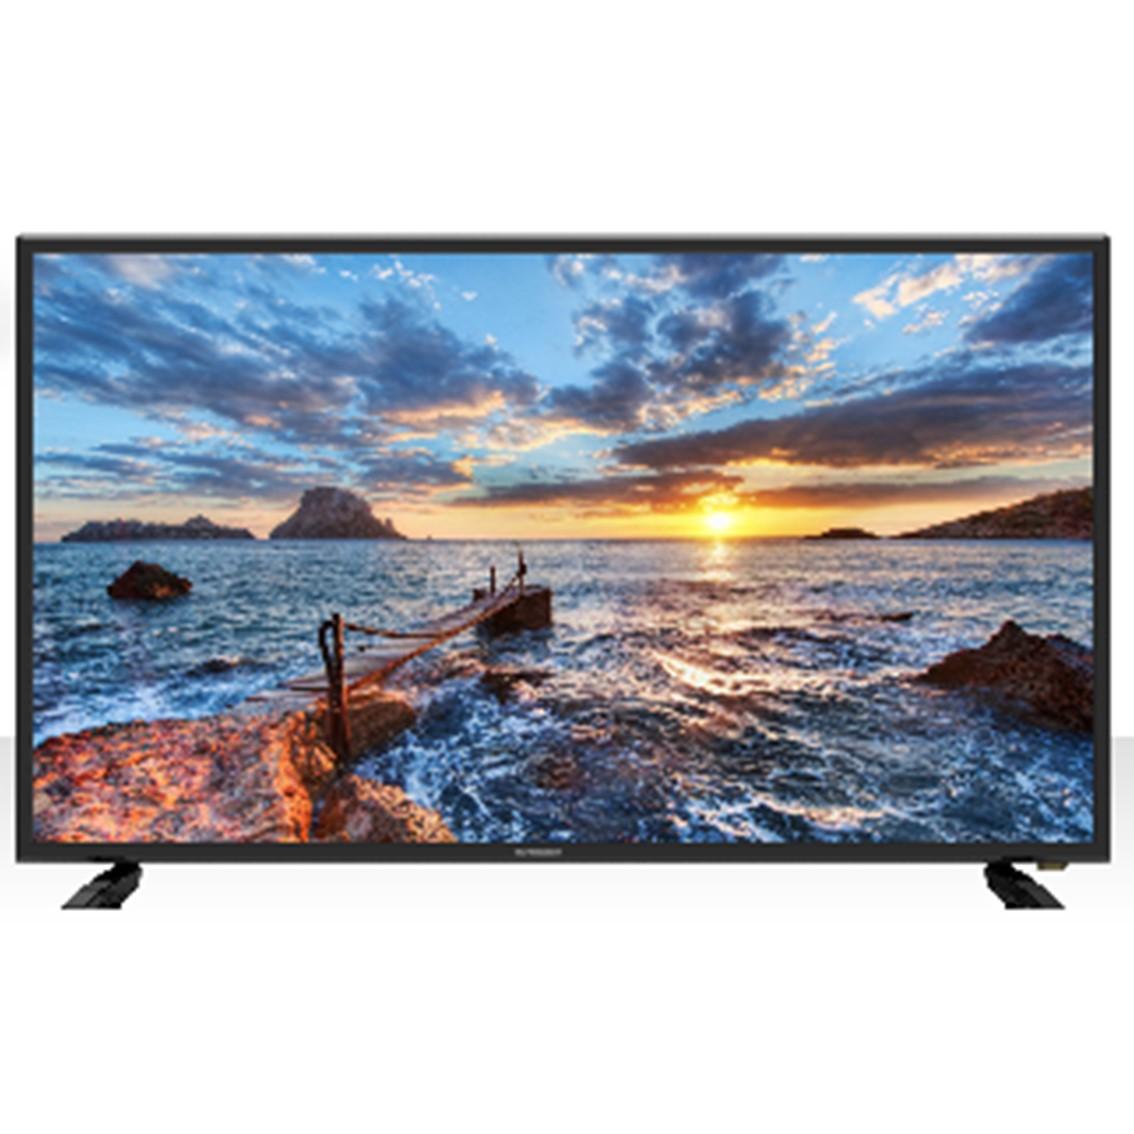 Tv schneider 40pulgadas full hd - 2 hdmi - 2 usb -  dvb - t - t2 - c